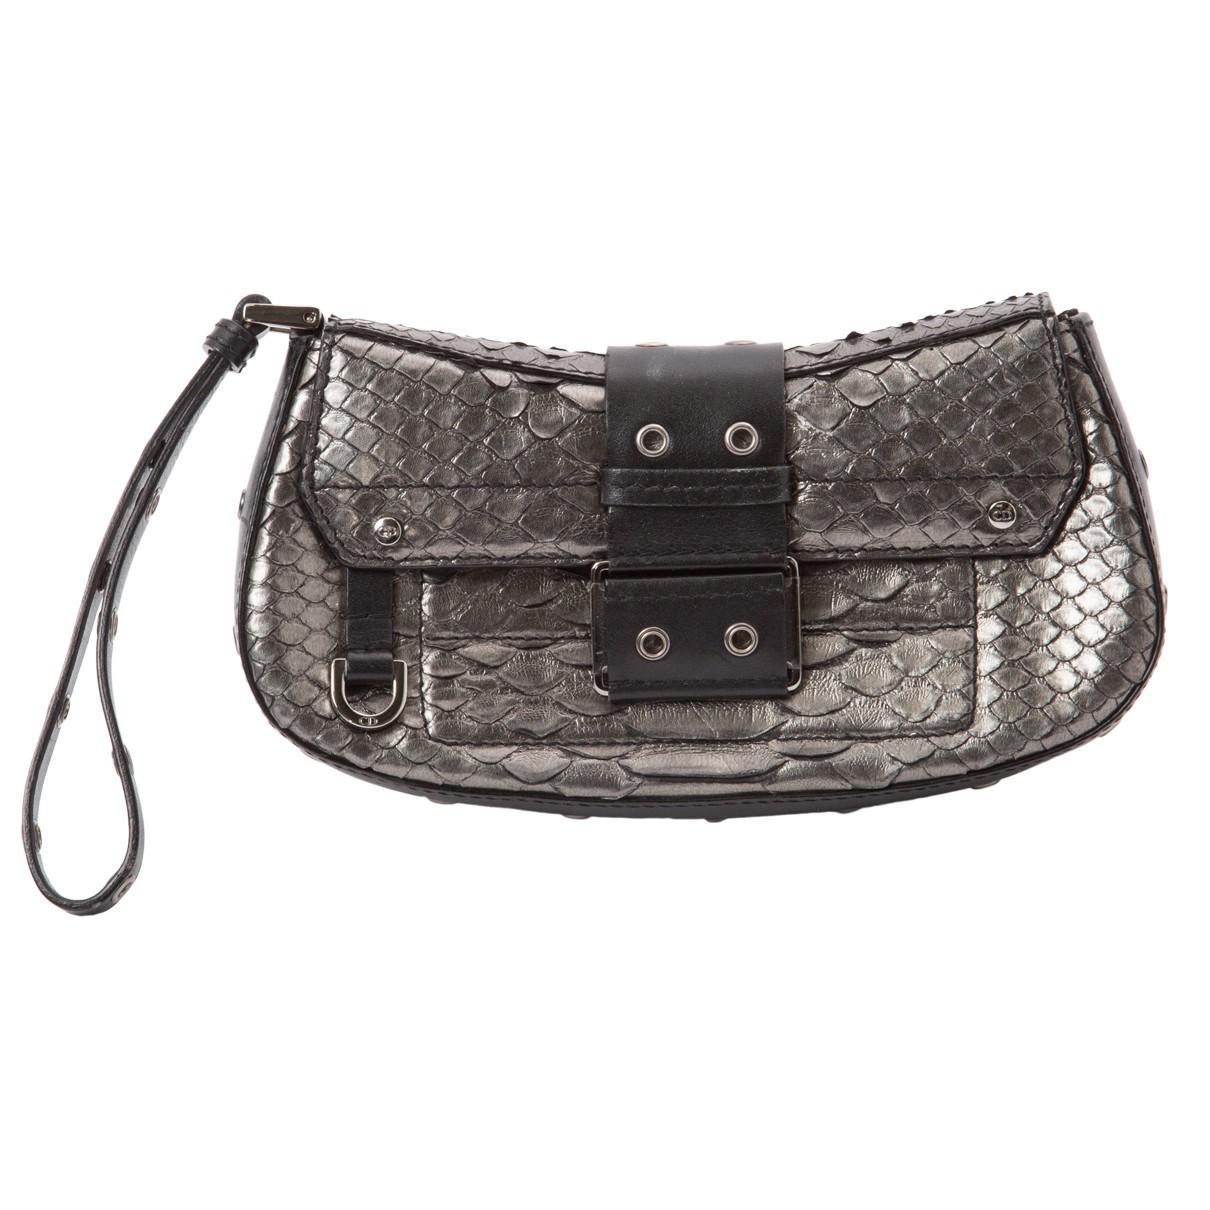 Dior Python Clutch Bag in Metallic - Lyst 728667d7060b0